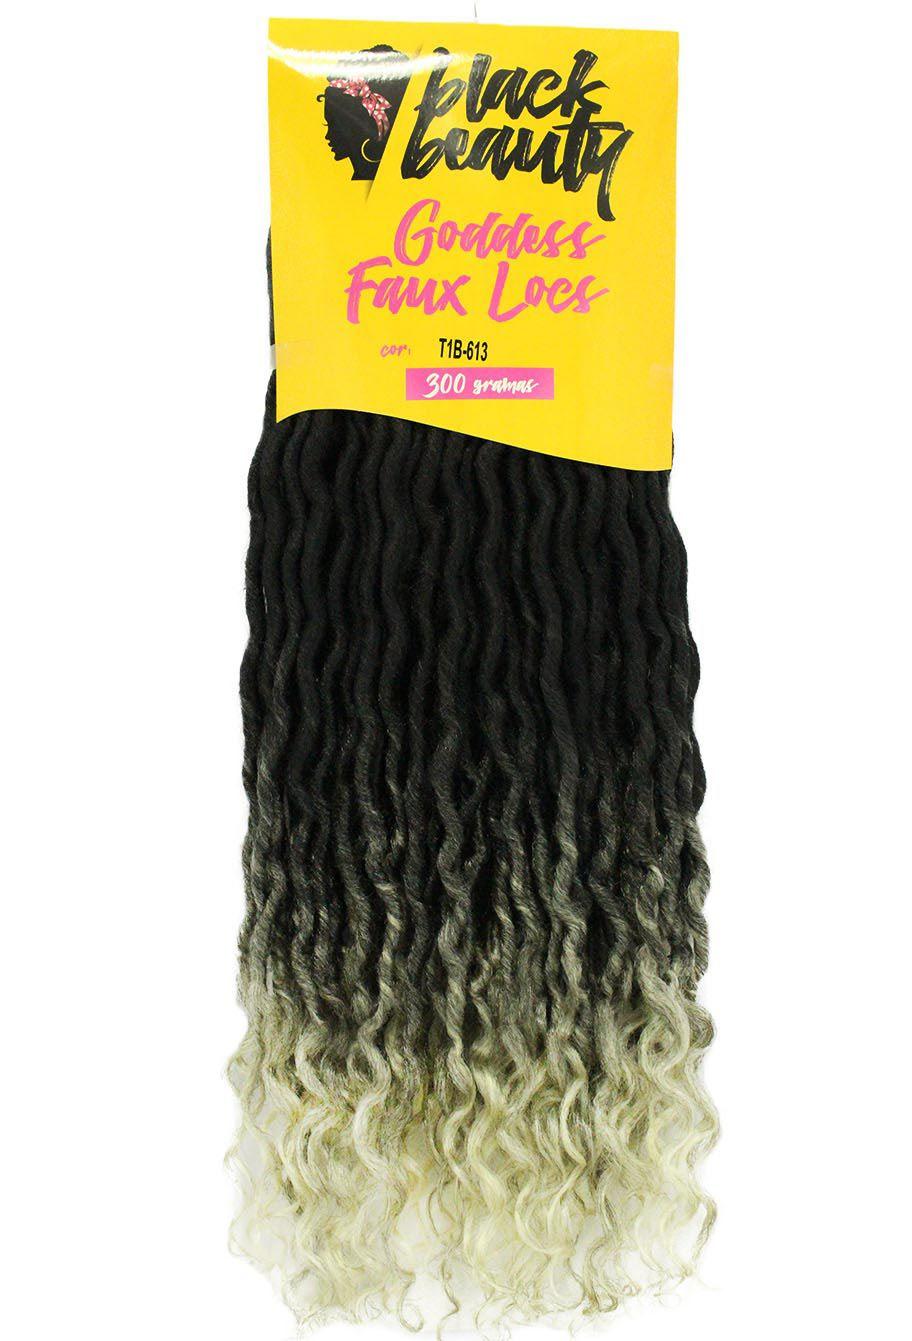 Cabelo Sintético - Black Beauty - Goddess Faux Locs